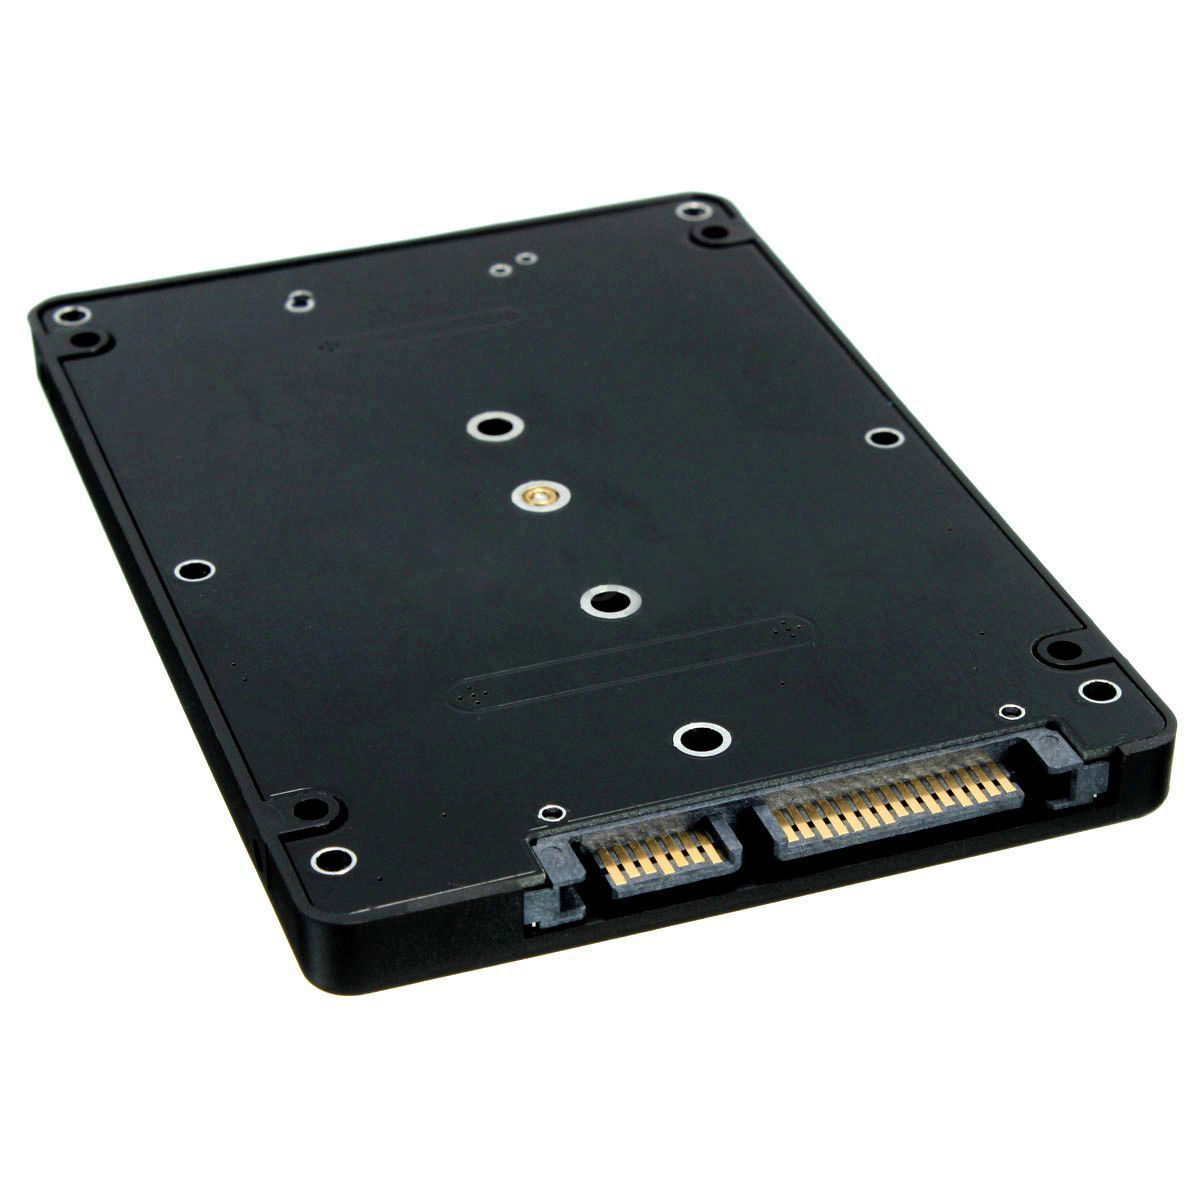 M.2 NGFF (SATA) SSD To 2.5 Inch SATA Adapter Card 8mm Thickness Enclosure IO M.2 SATA SSD Adapter To Desktop/Notebook Computer